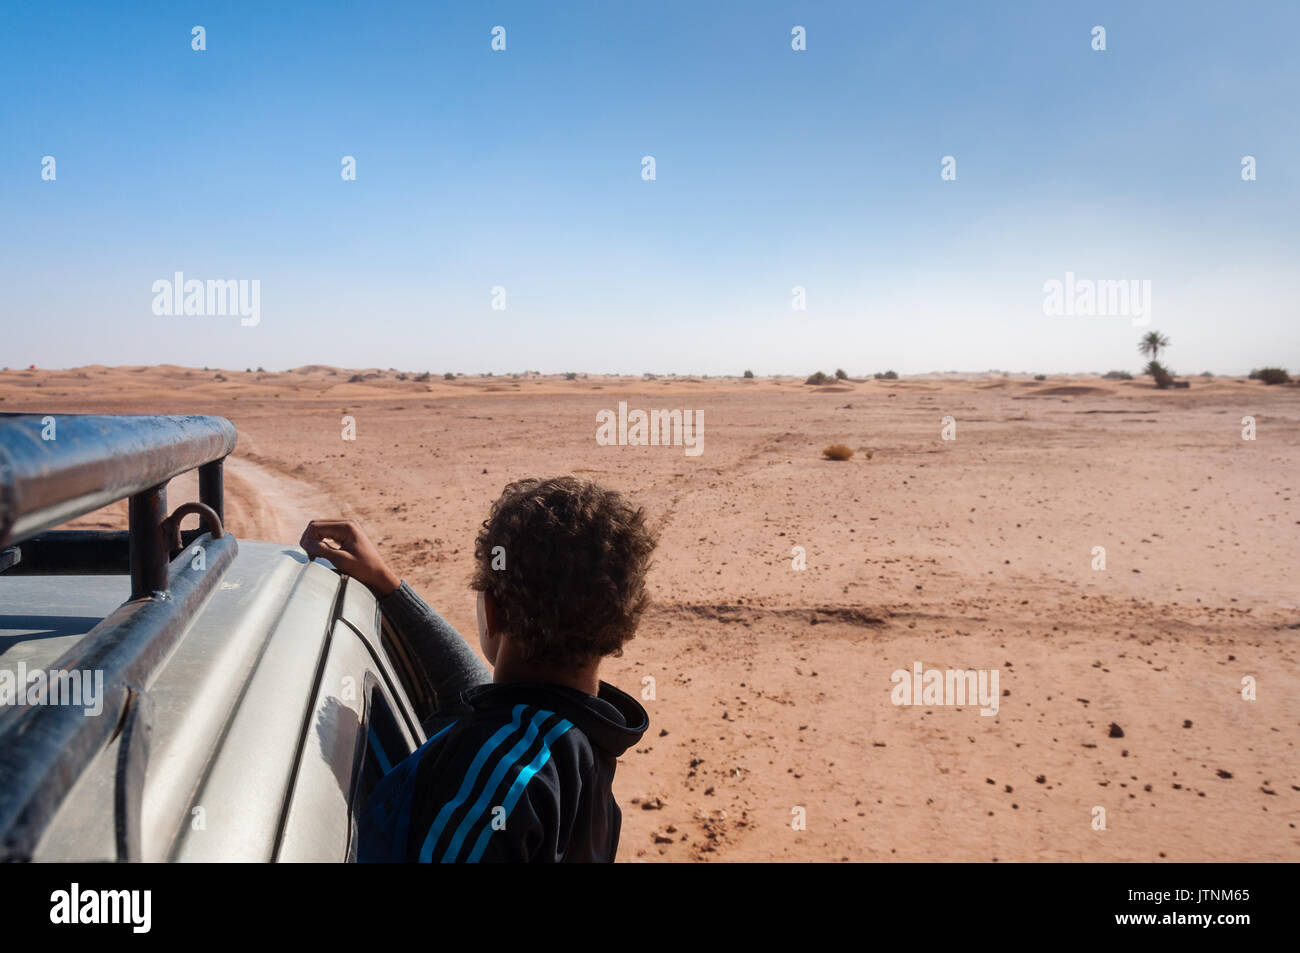 Child hanging outside a car, Desert - Stock Image